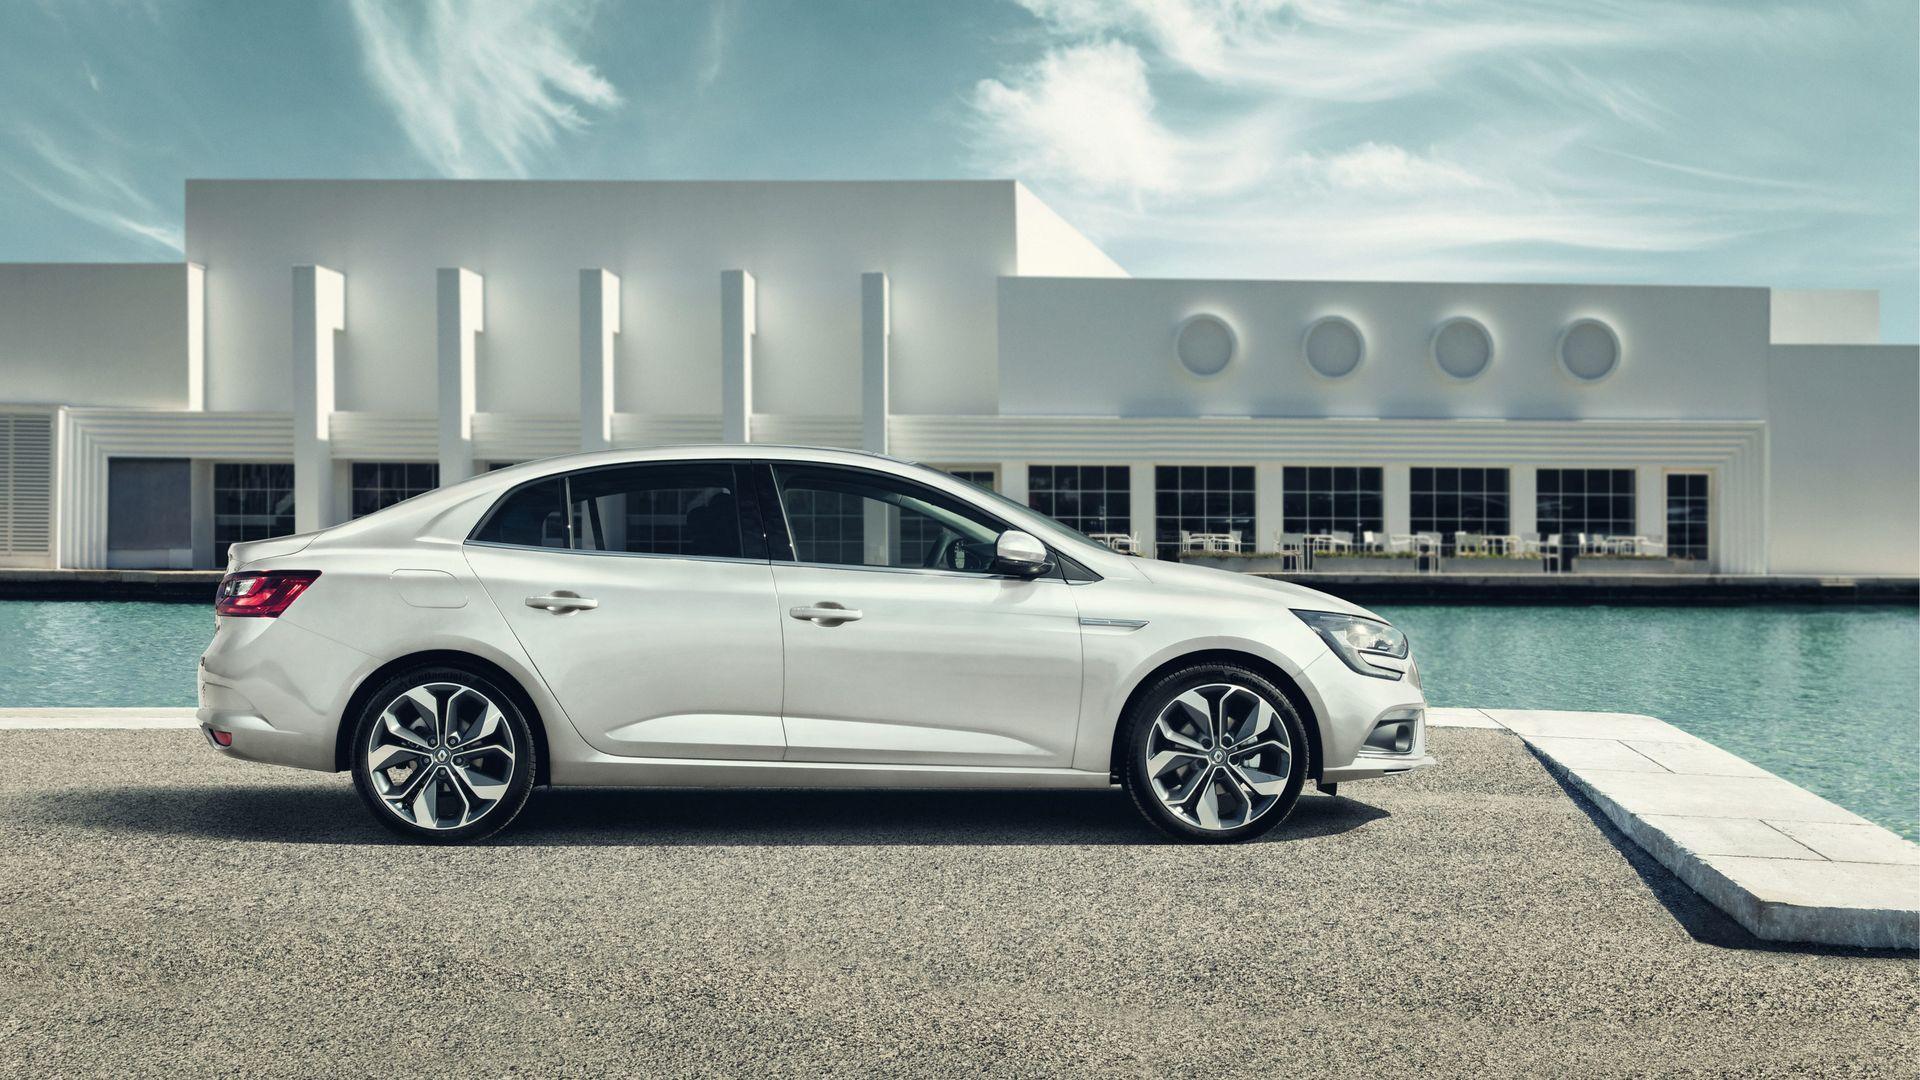 Внешний дизайн нового MEGANE Sedan (Меган Седан)